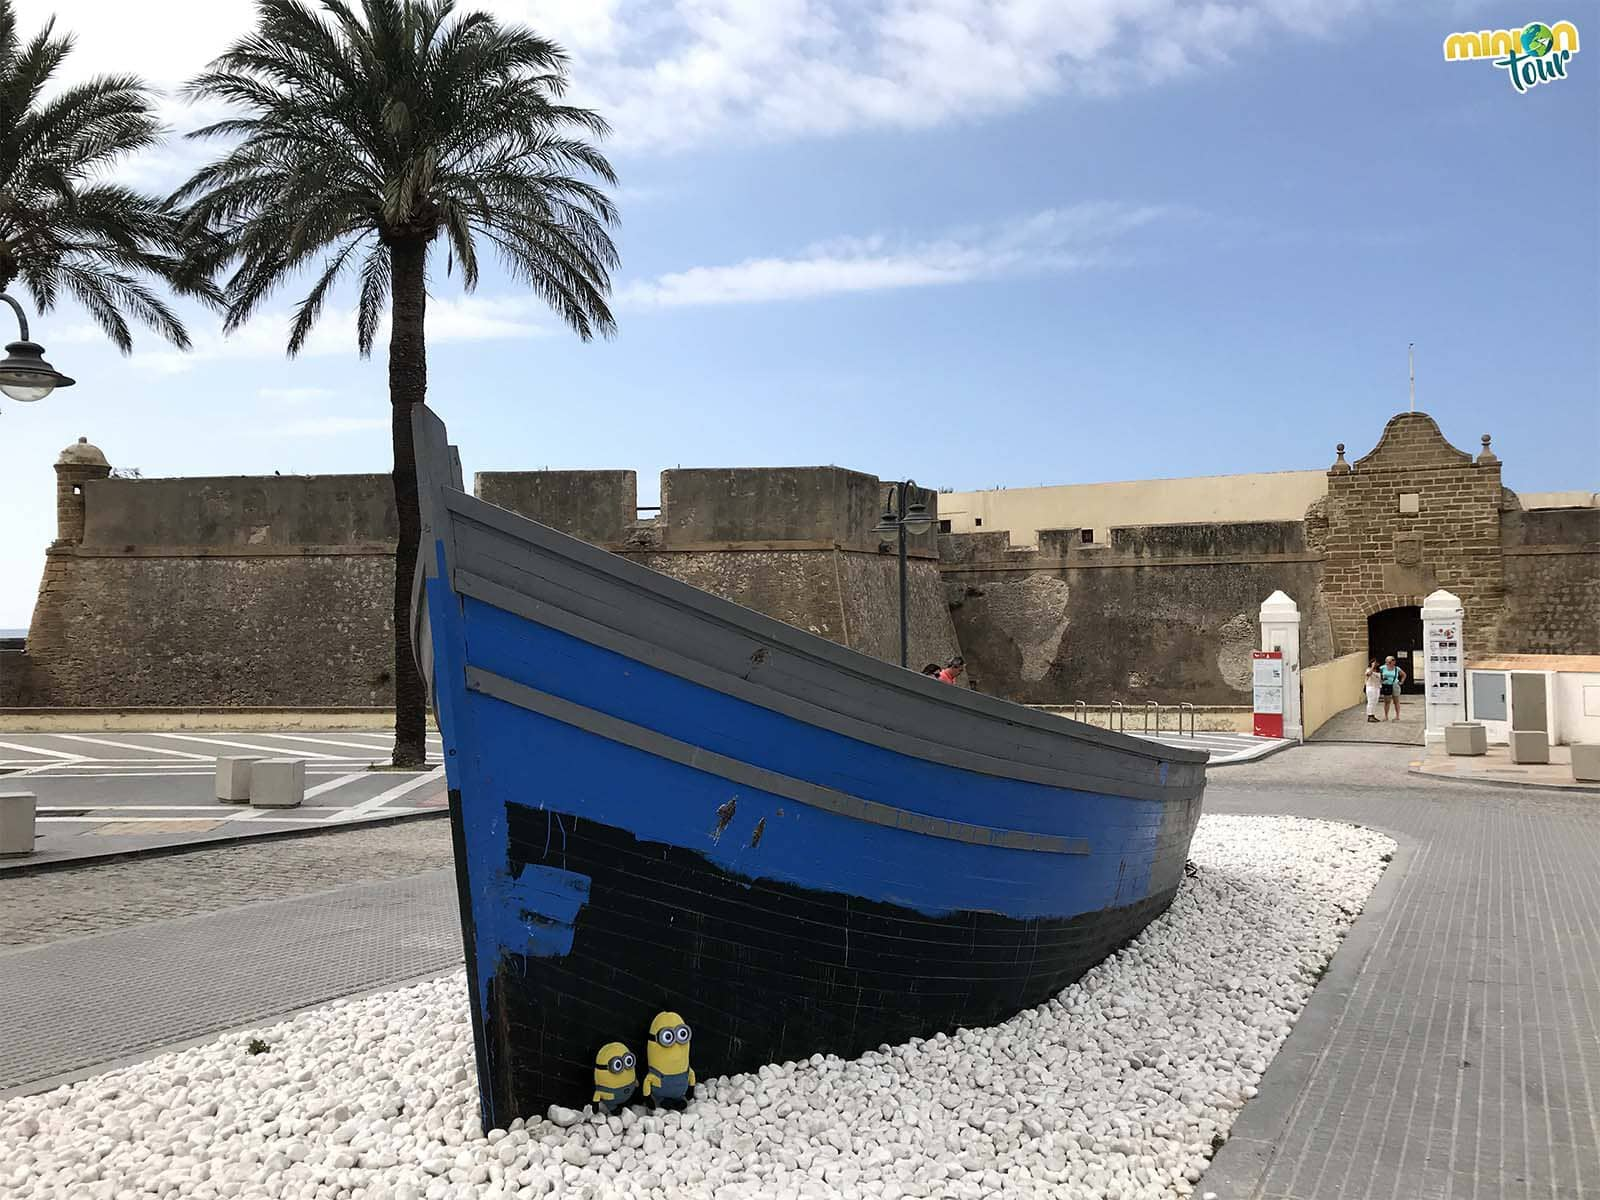 MiniOnTour a punto de ver el Castillo de Santa Catalina